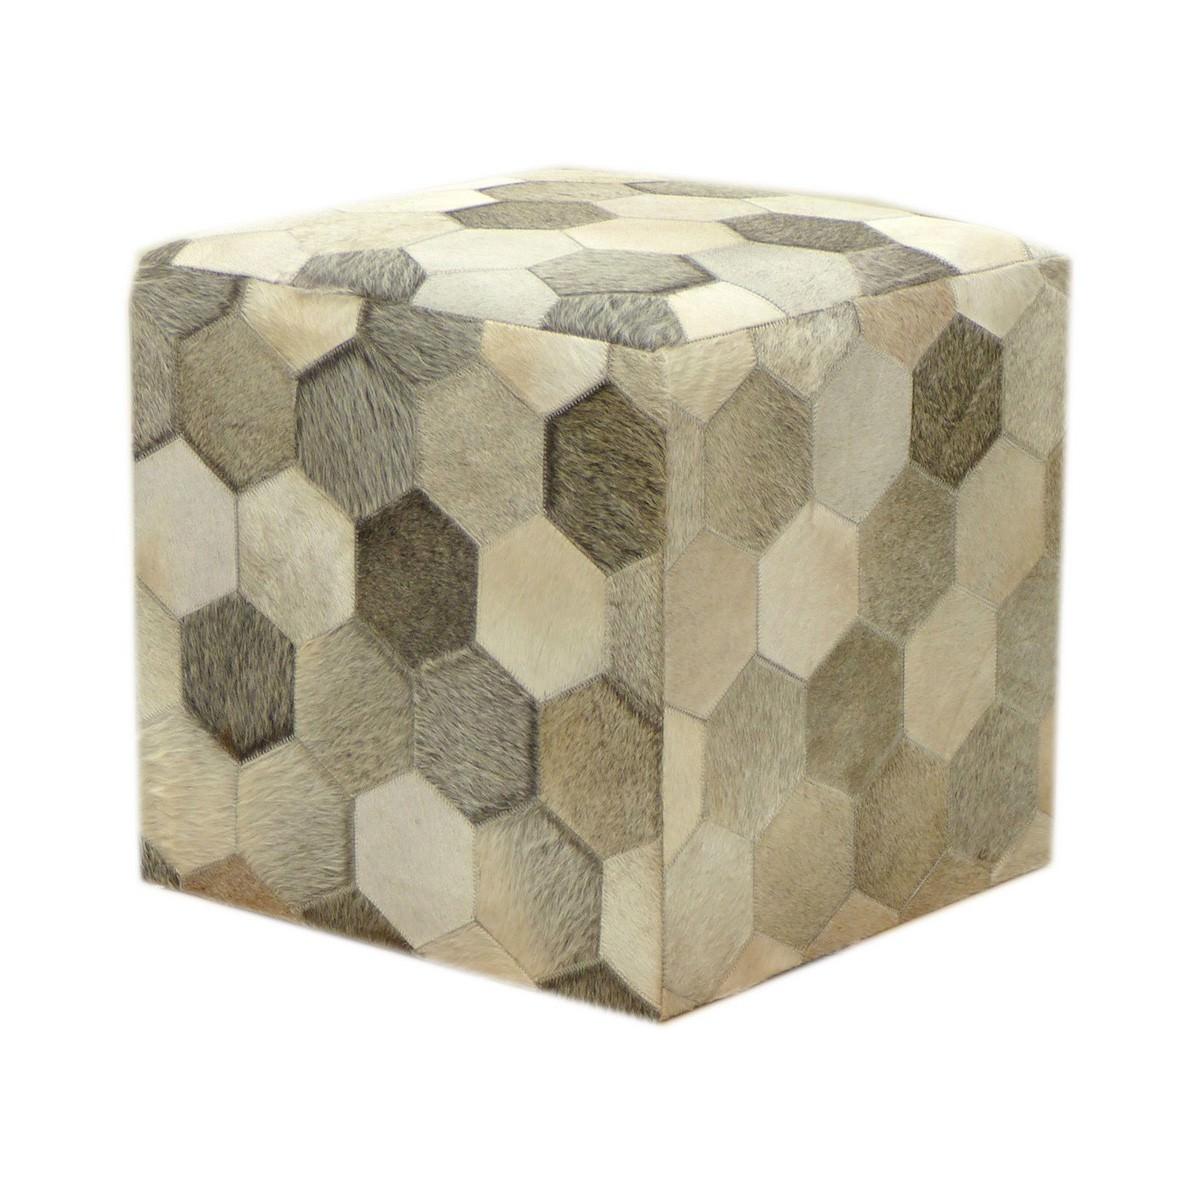 Cybele Hexagonal Patchwork Cowhide Ottoman